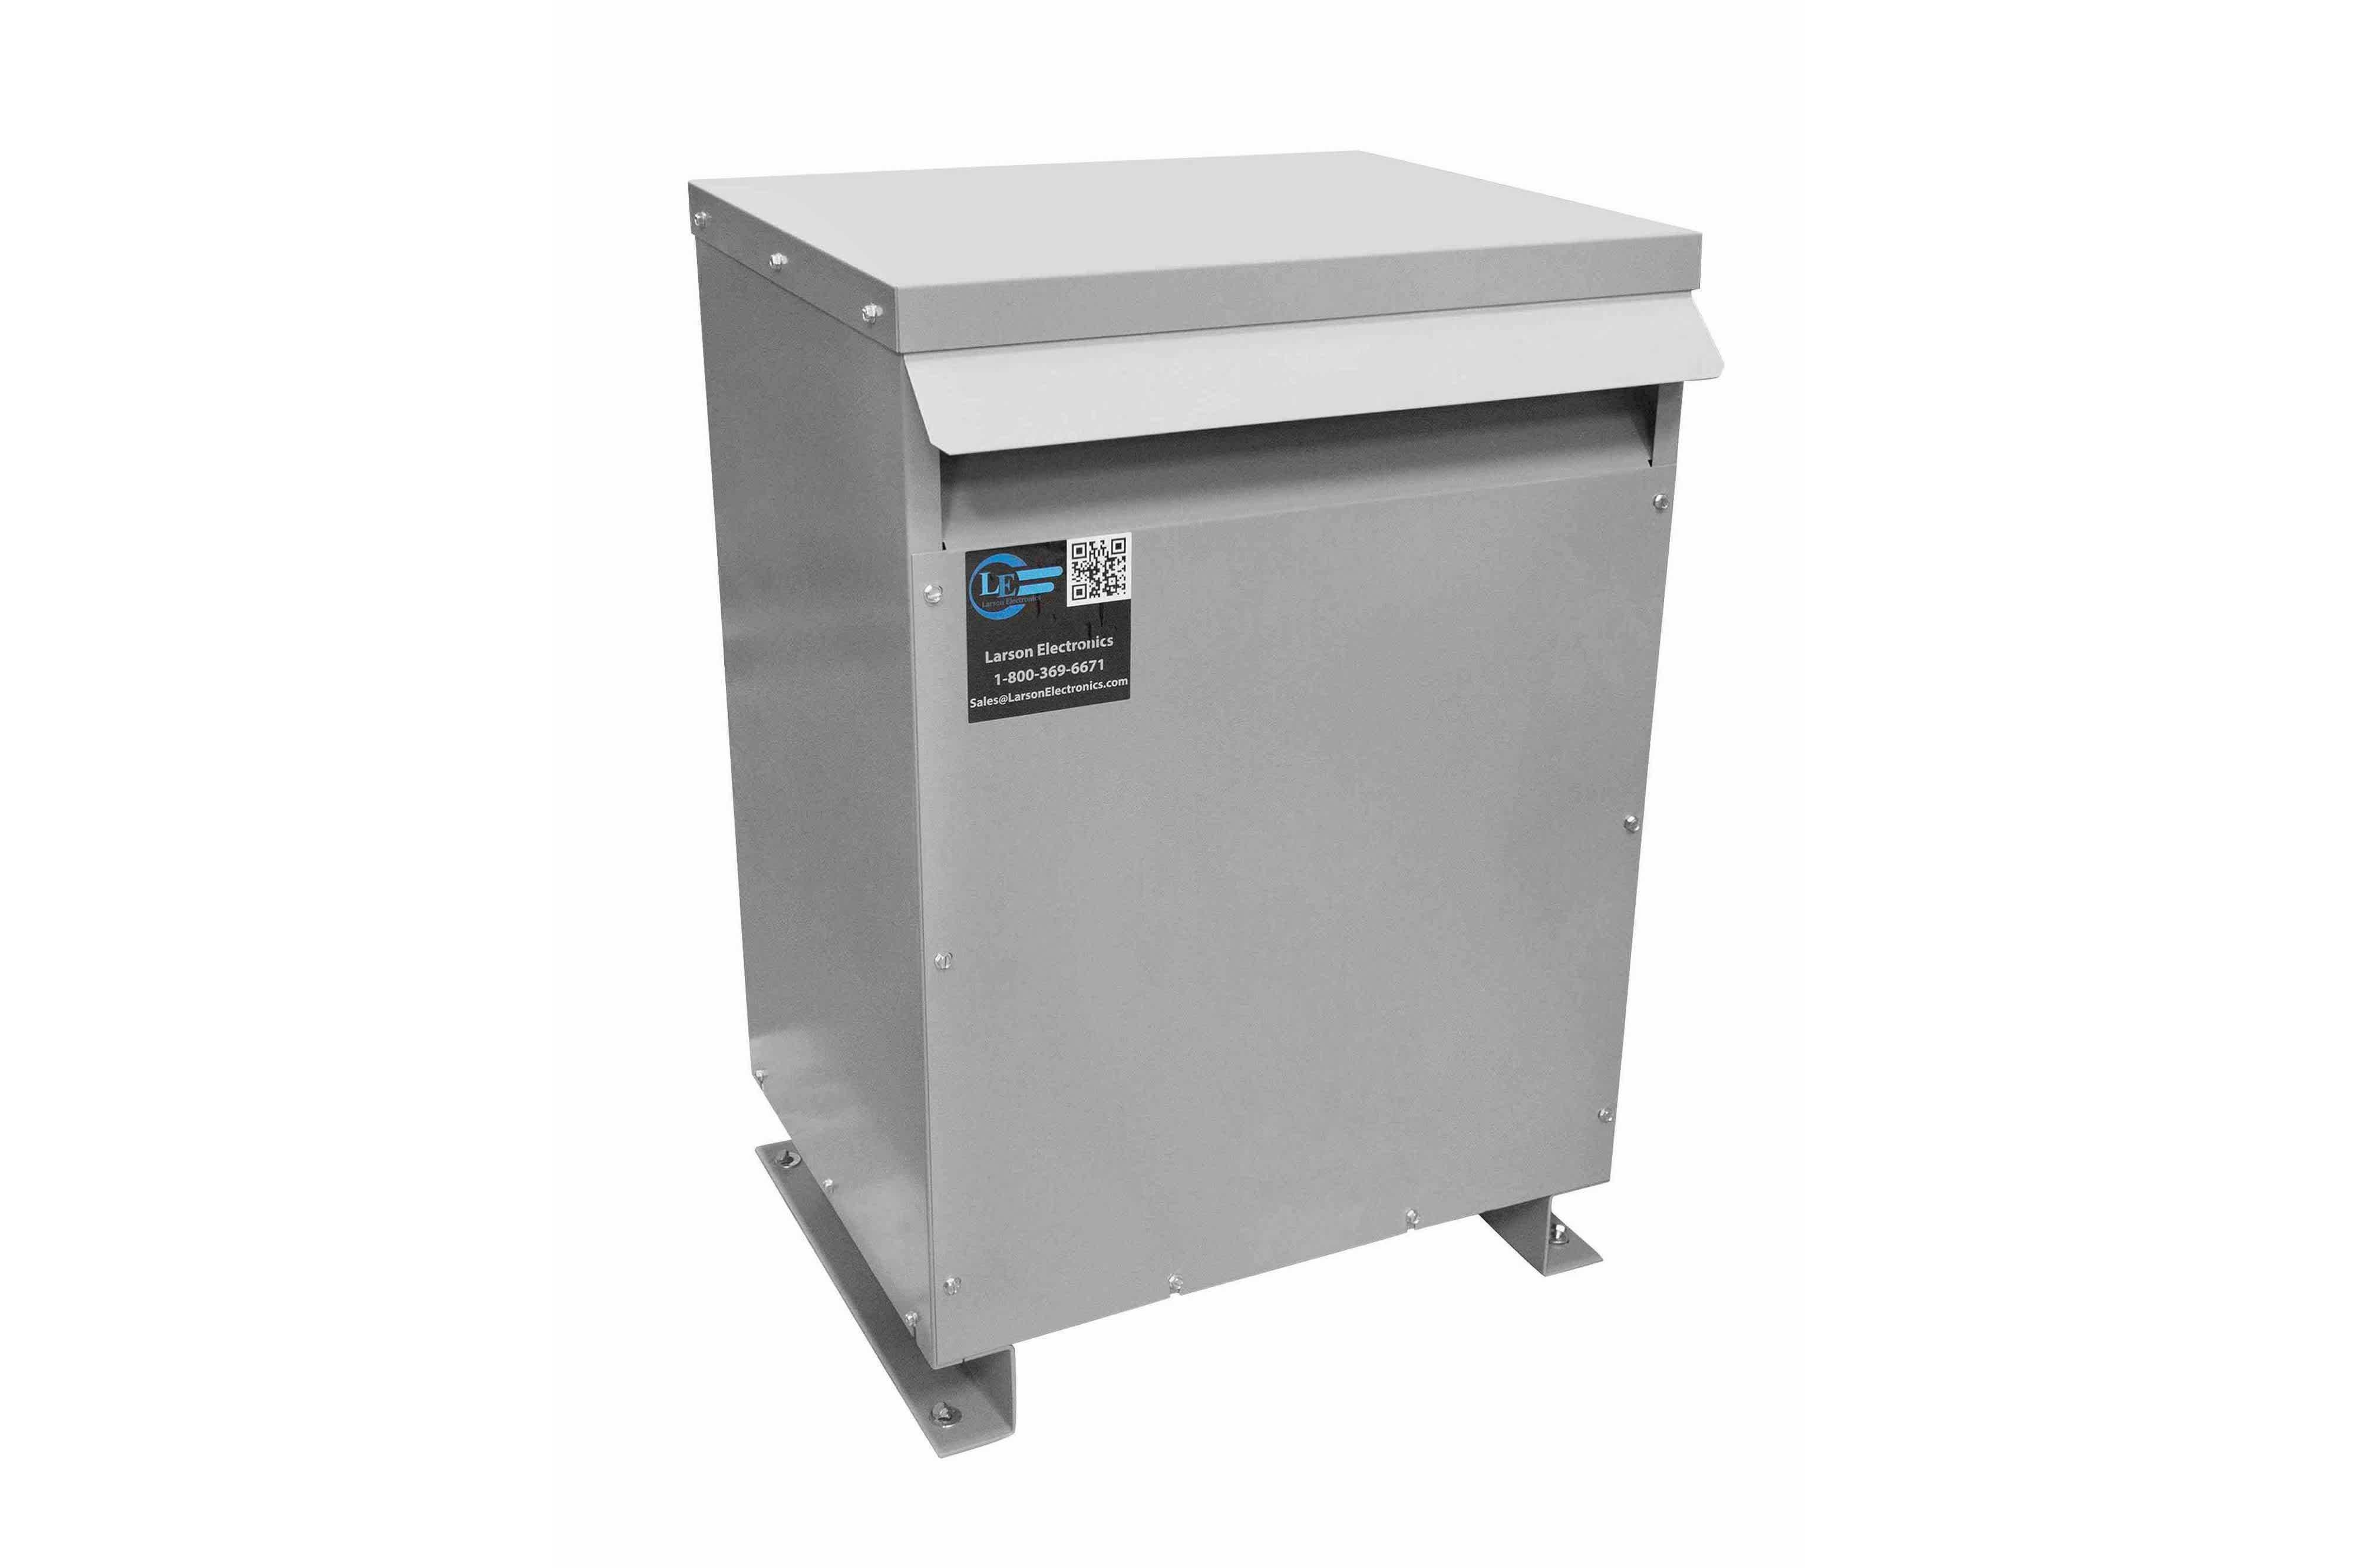 150 kVA 3PH Isolation Transformer, 380V Wye Primary, 600Y/347 Wye-N Secondary, N3R, Ventilated, 60 Hz